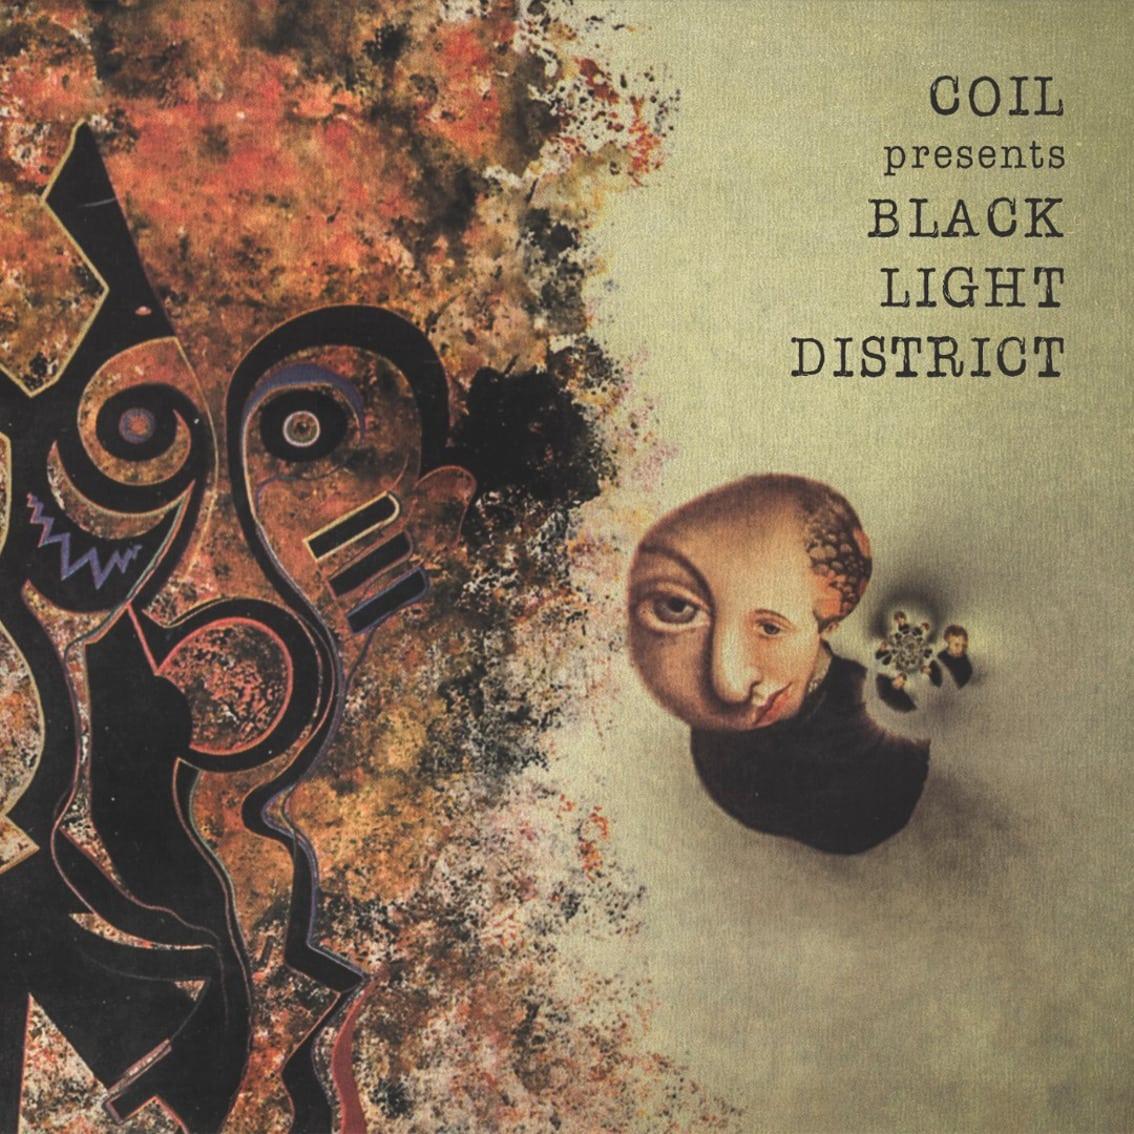 Classic Coil aka Black Light District album gets reissue with bonus track